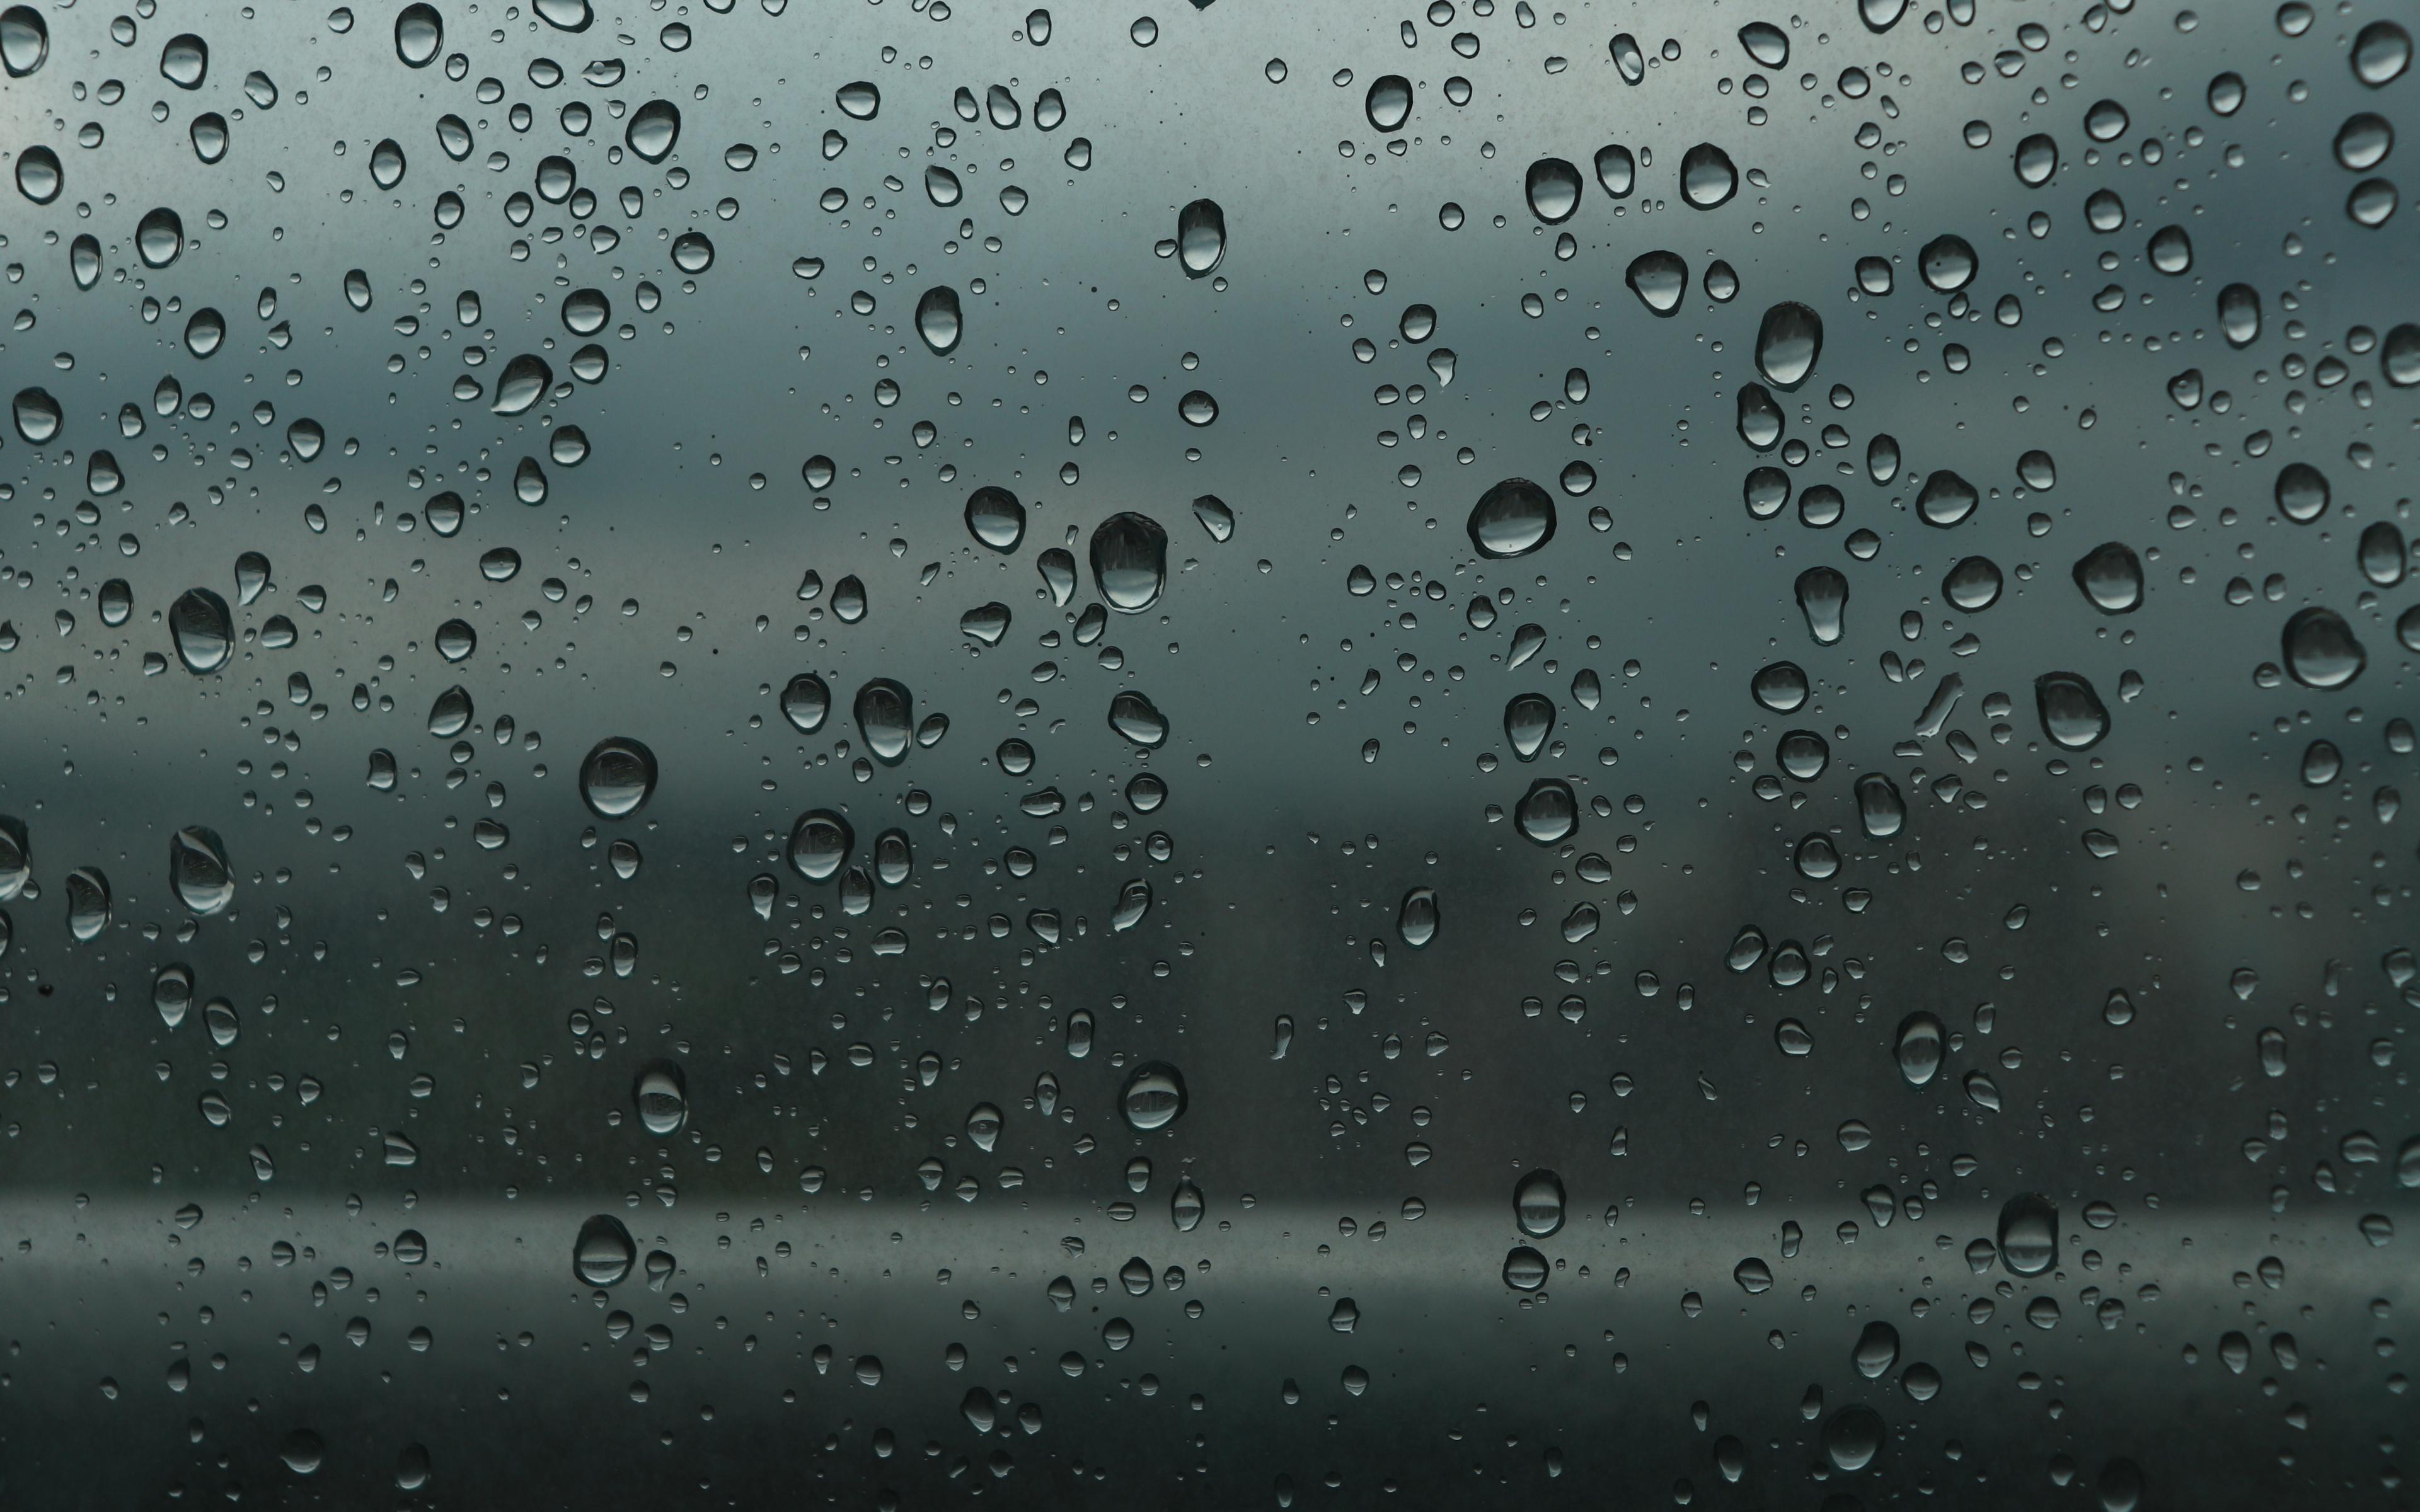 Download 3840x2400 Wallpaper Water Drops Glass S Wet Surface 4k Ultra Hd 16 10 Widescreen 3840x2400 Hd Image Background 1224